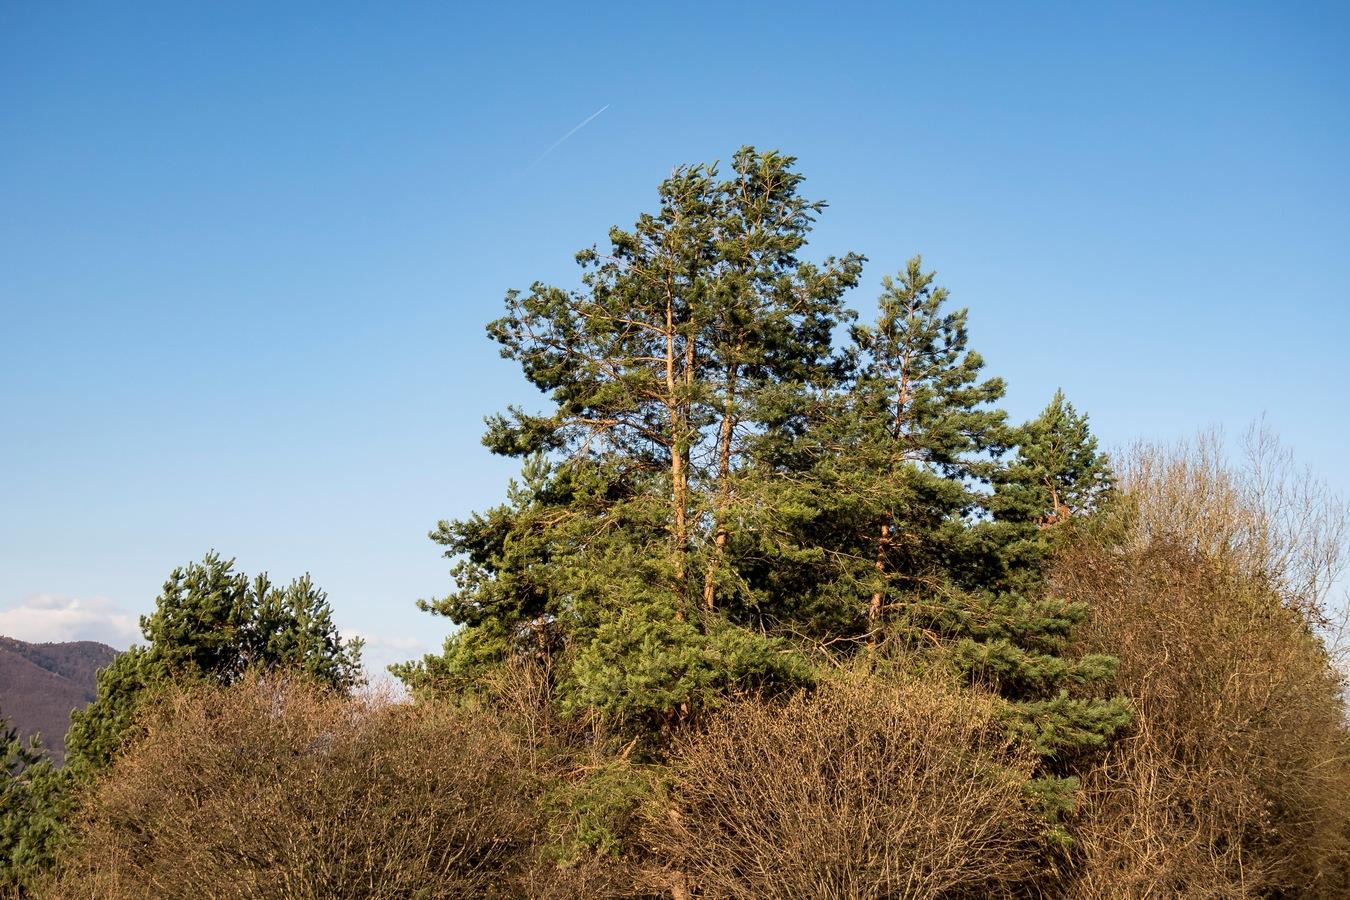 Strom vo vetre